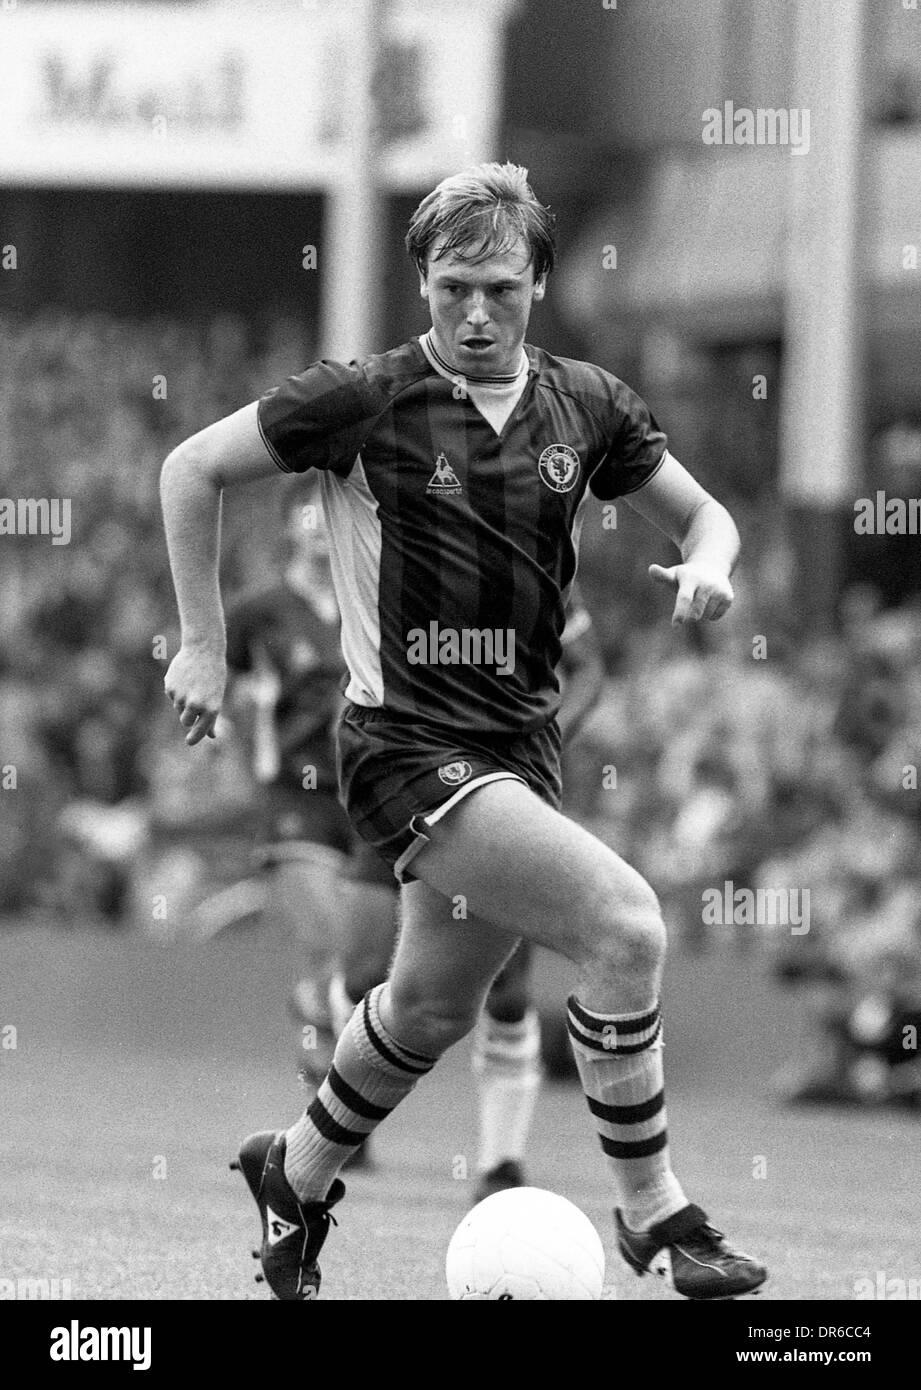 Steve McMahon Aston Villa Fußballer 24.09.1983 Stockbild